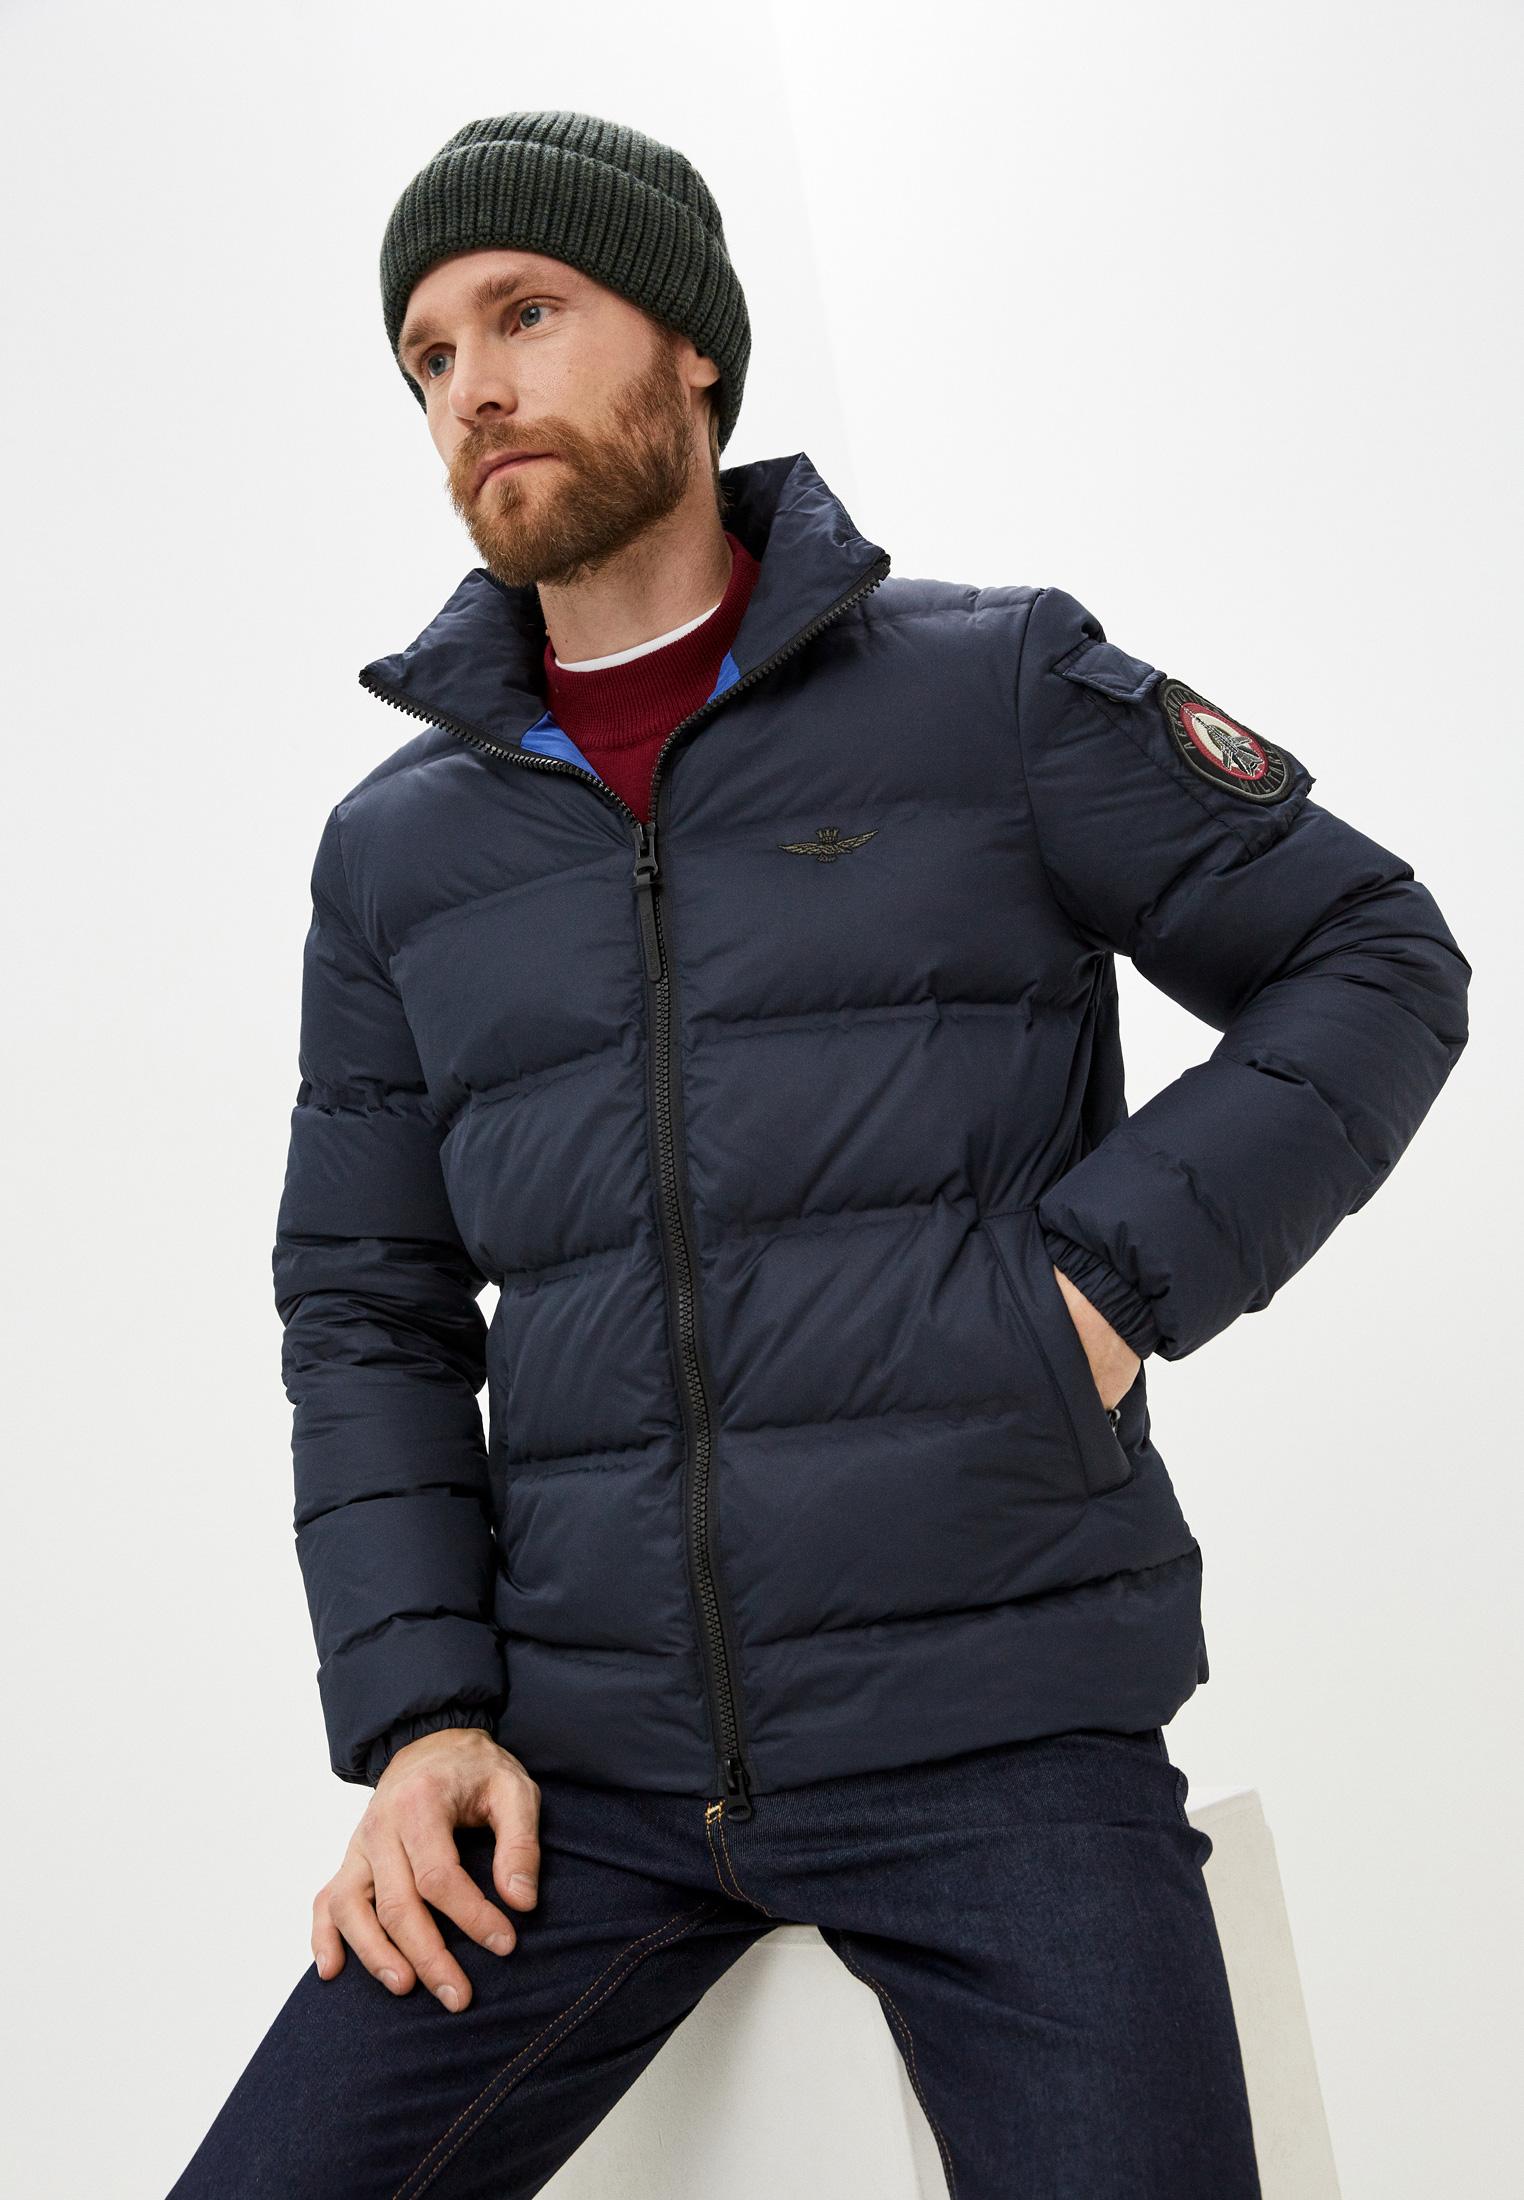 Утепленная куртка Aeronautica Militare Куртка утепленная Aeronautica Militare